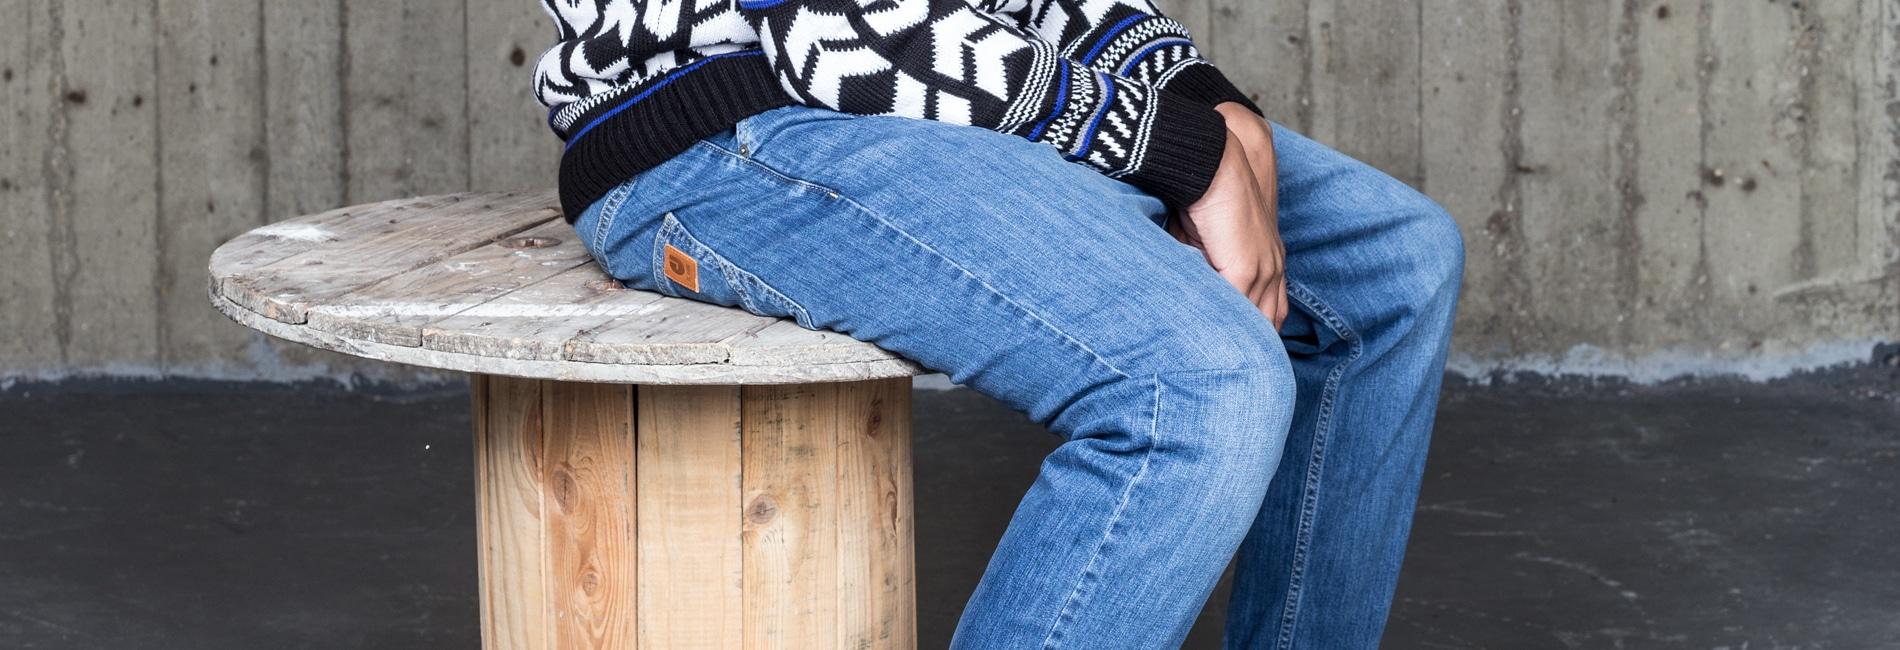 jeans sarouel page jeans dcjeans